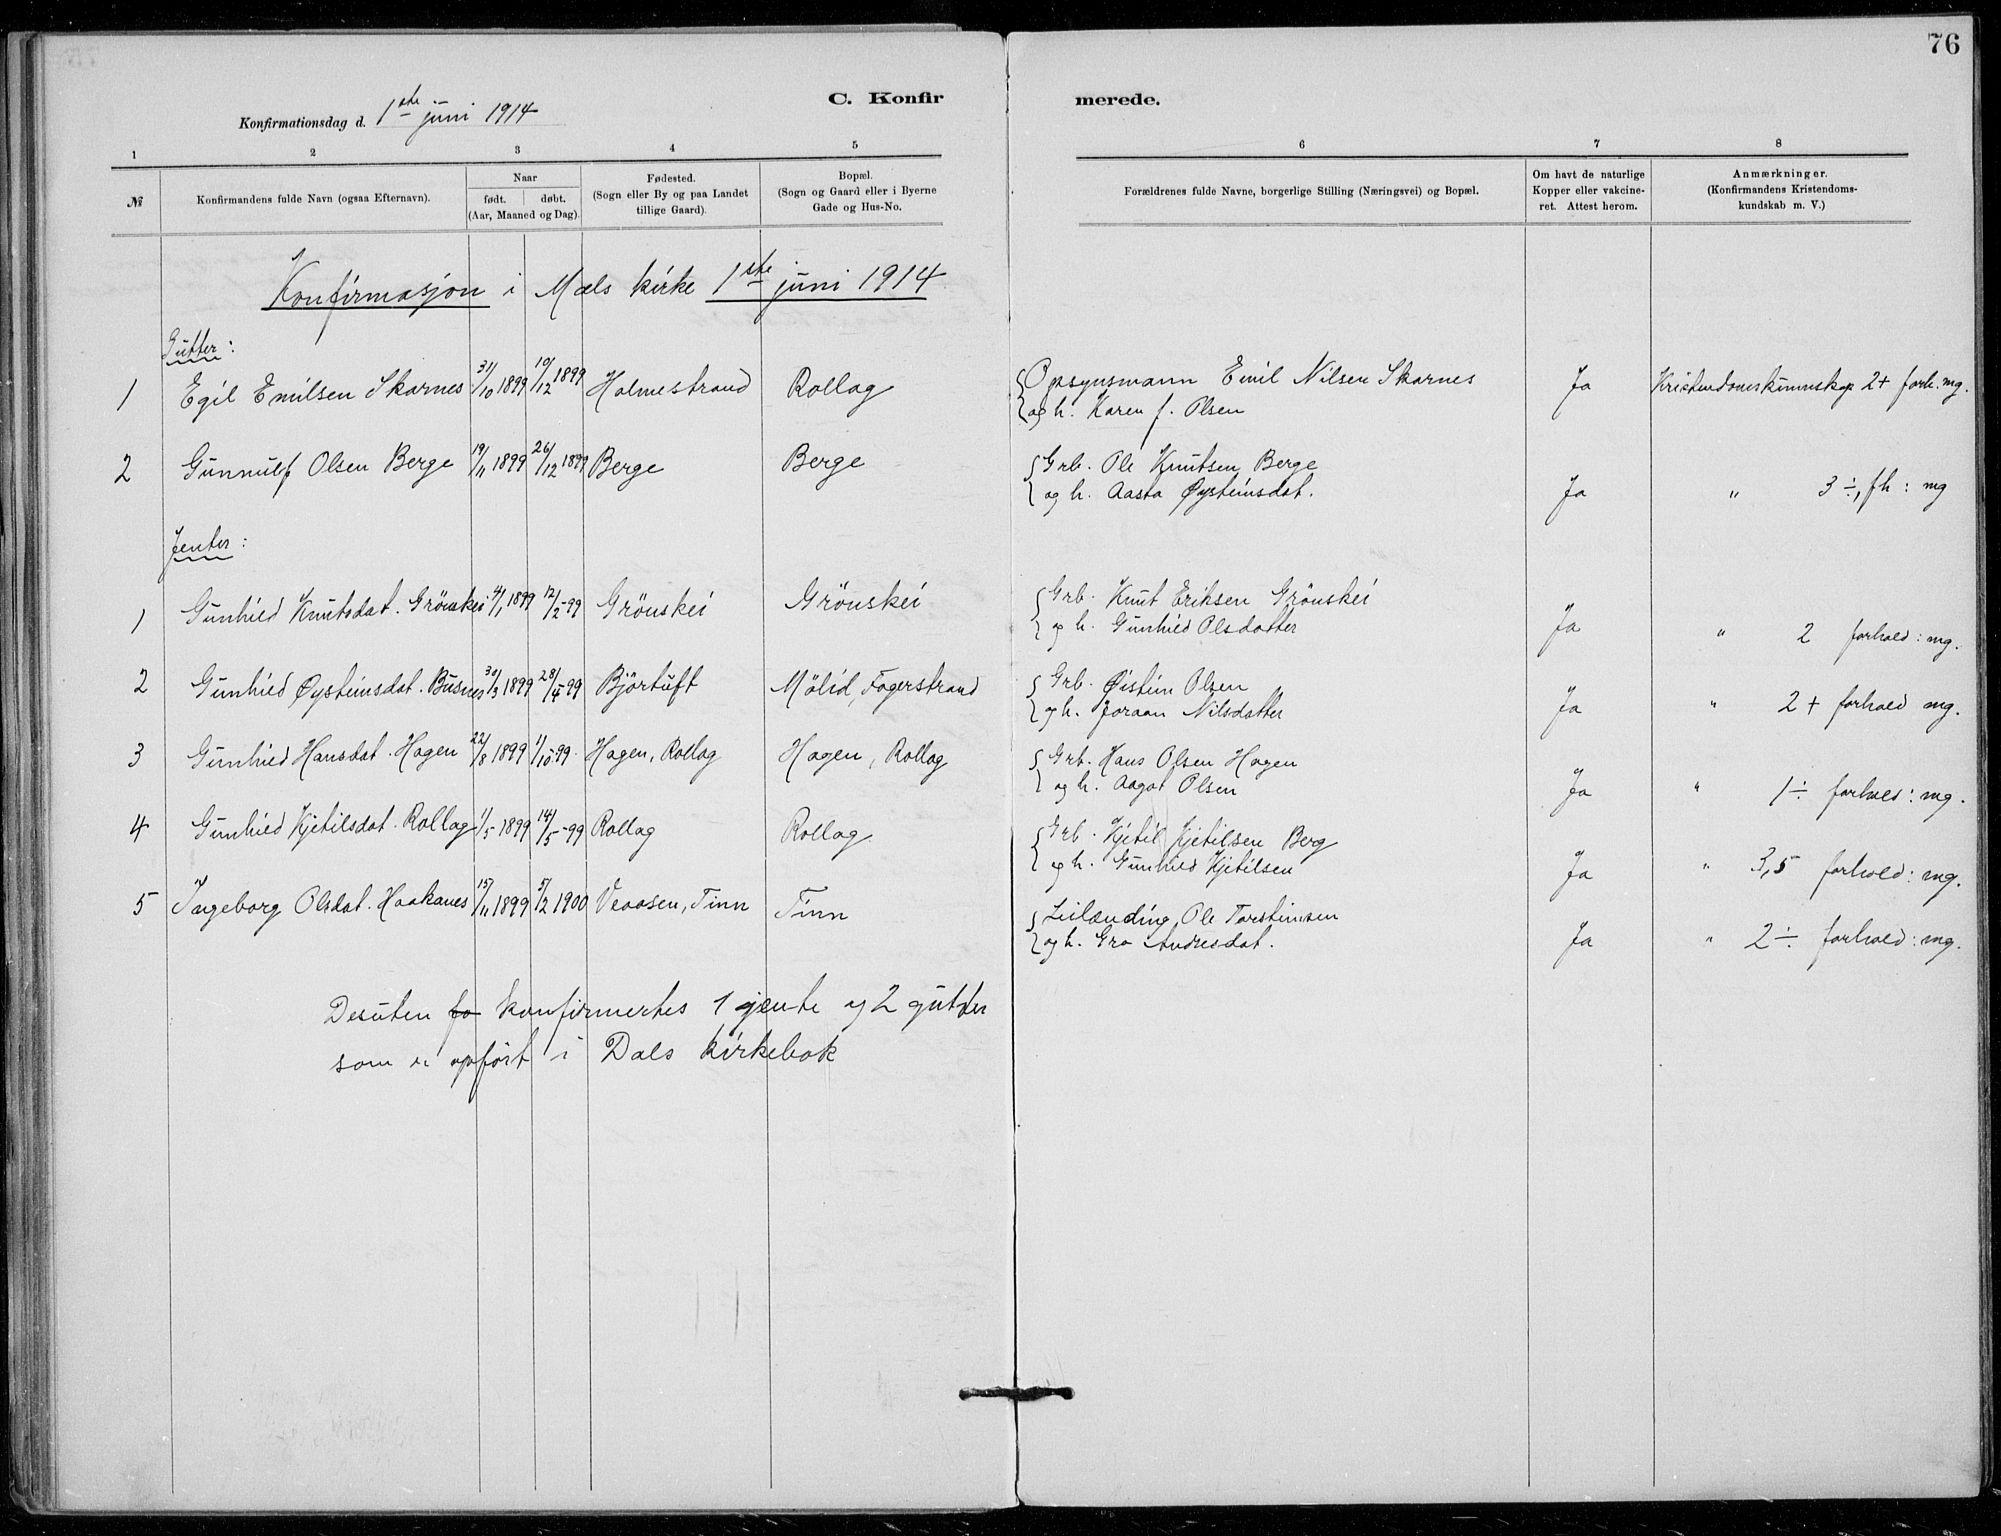 SAKO, Tinn kirkebøker, F/Fb/L0002: Ministerialbok nr. II 2, 1878-1917, s. 76